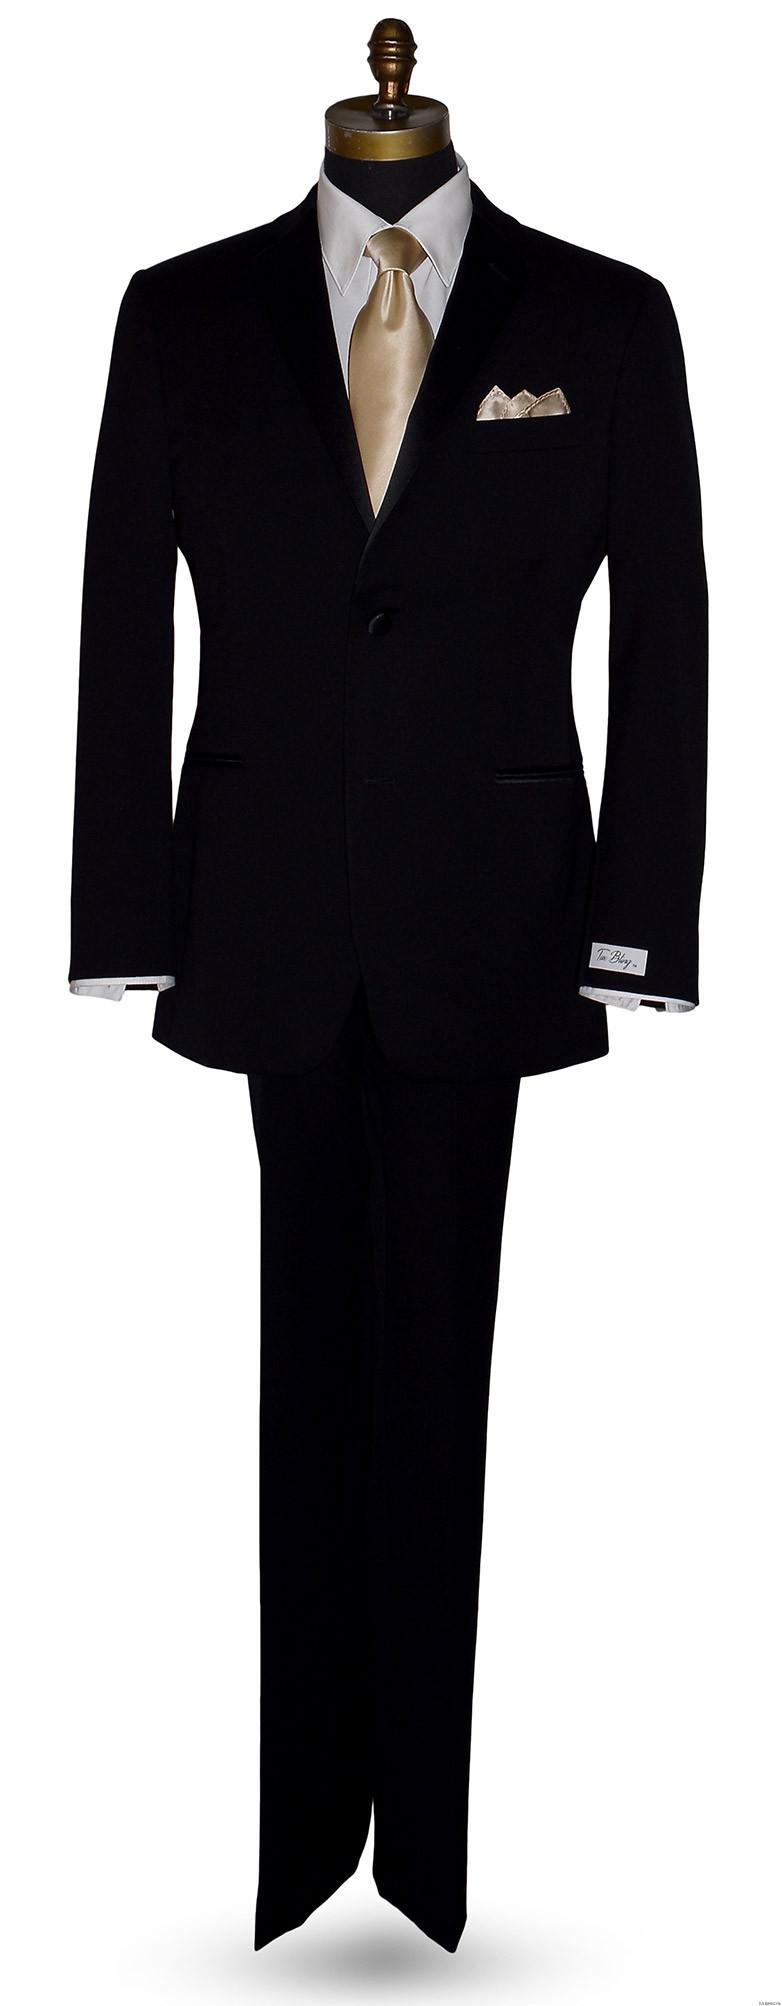 black notch lapel tuxedo by Tuxbling.com with champagne silk long dress tie for weddings